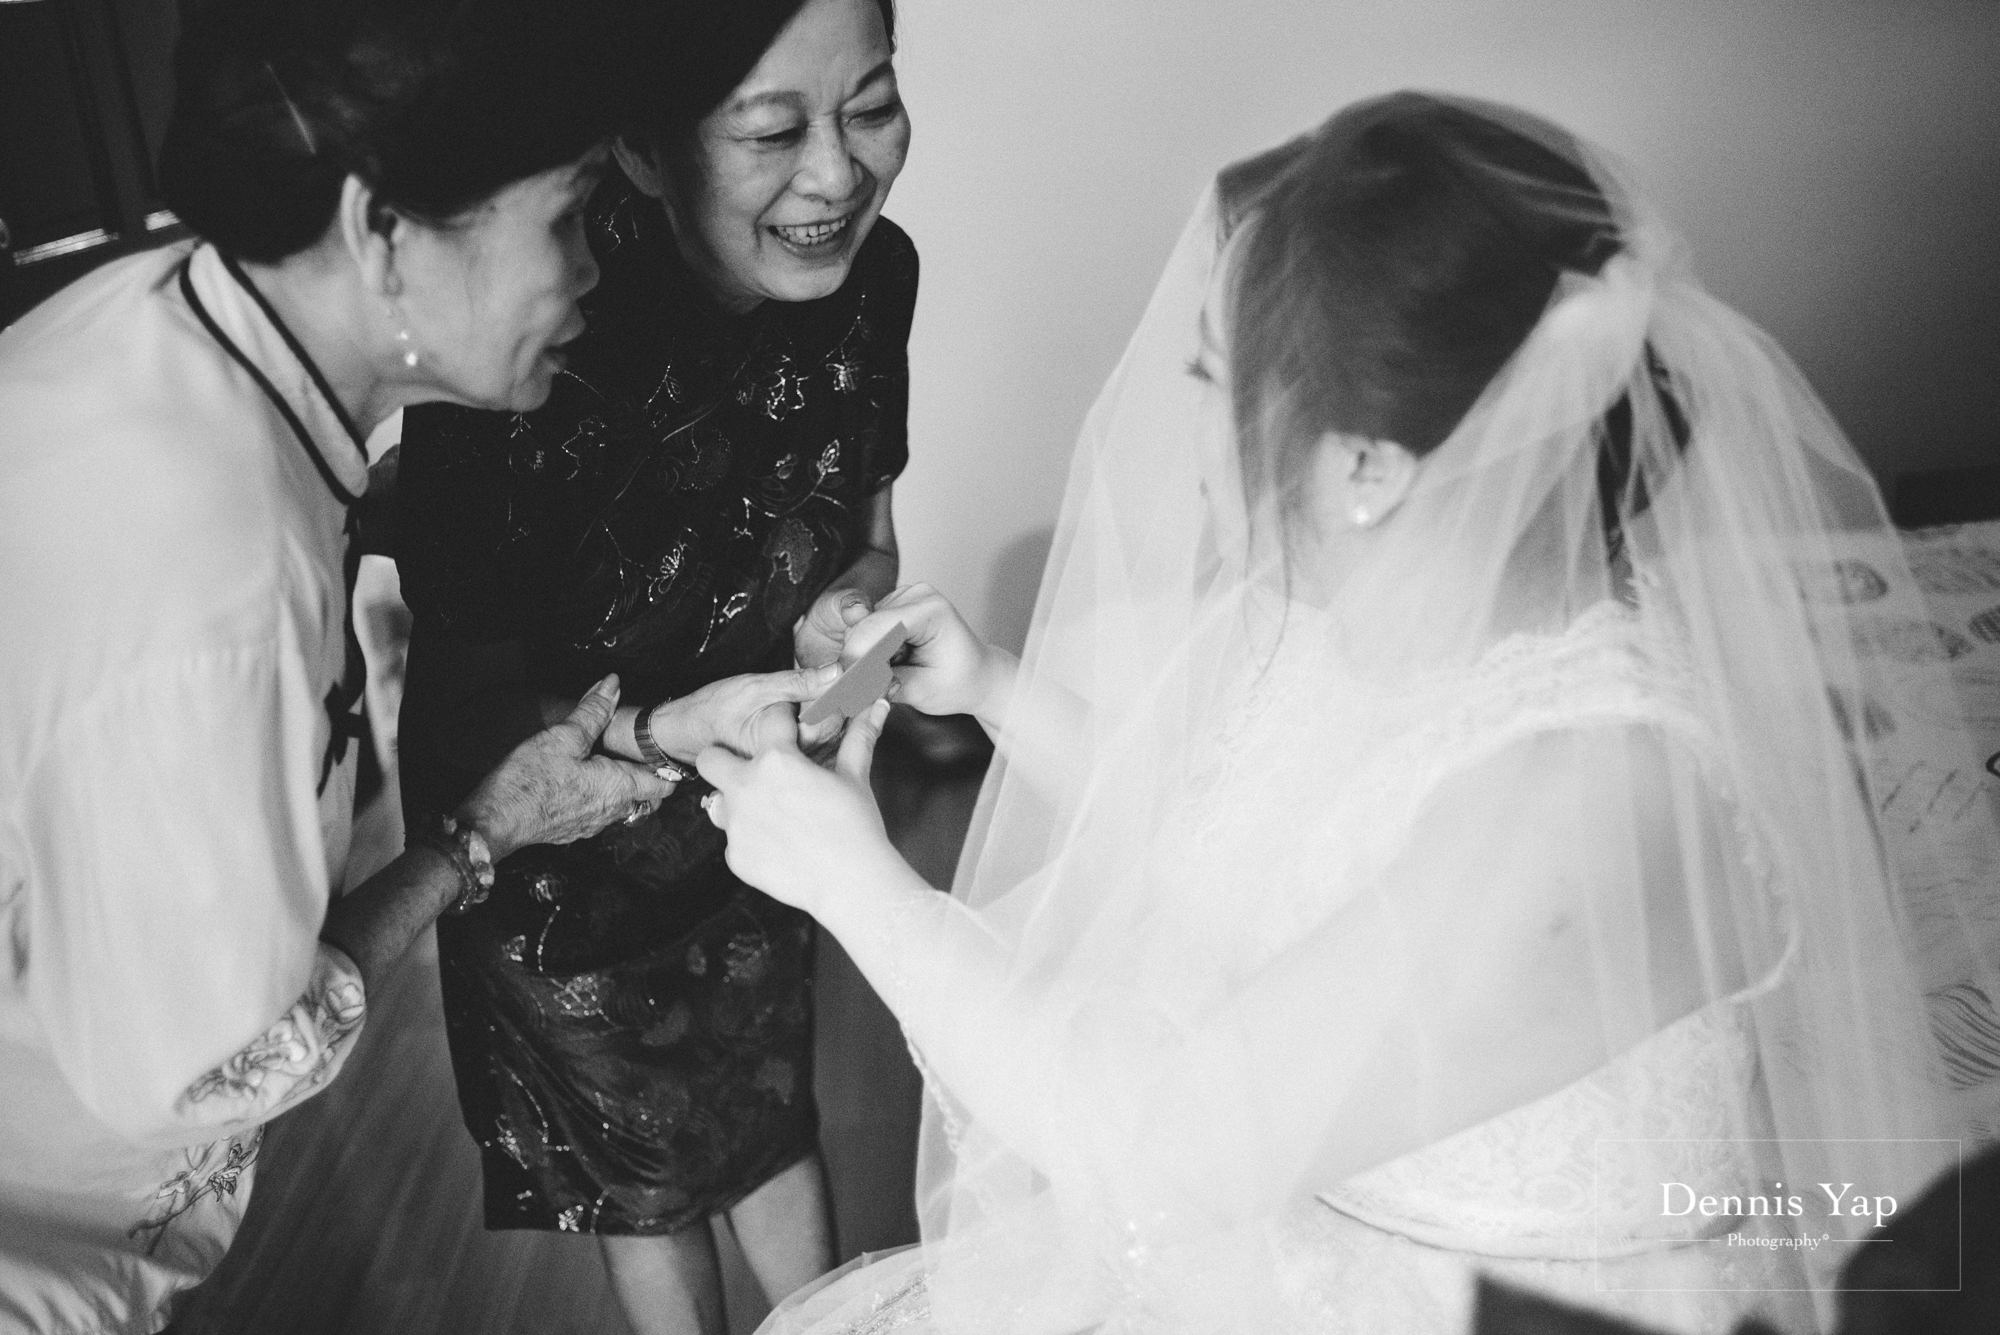 ino sheri black white church wedding st thomas more subang jaya dennis yap photography touching love beloved australia indonesia-6.jpg